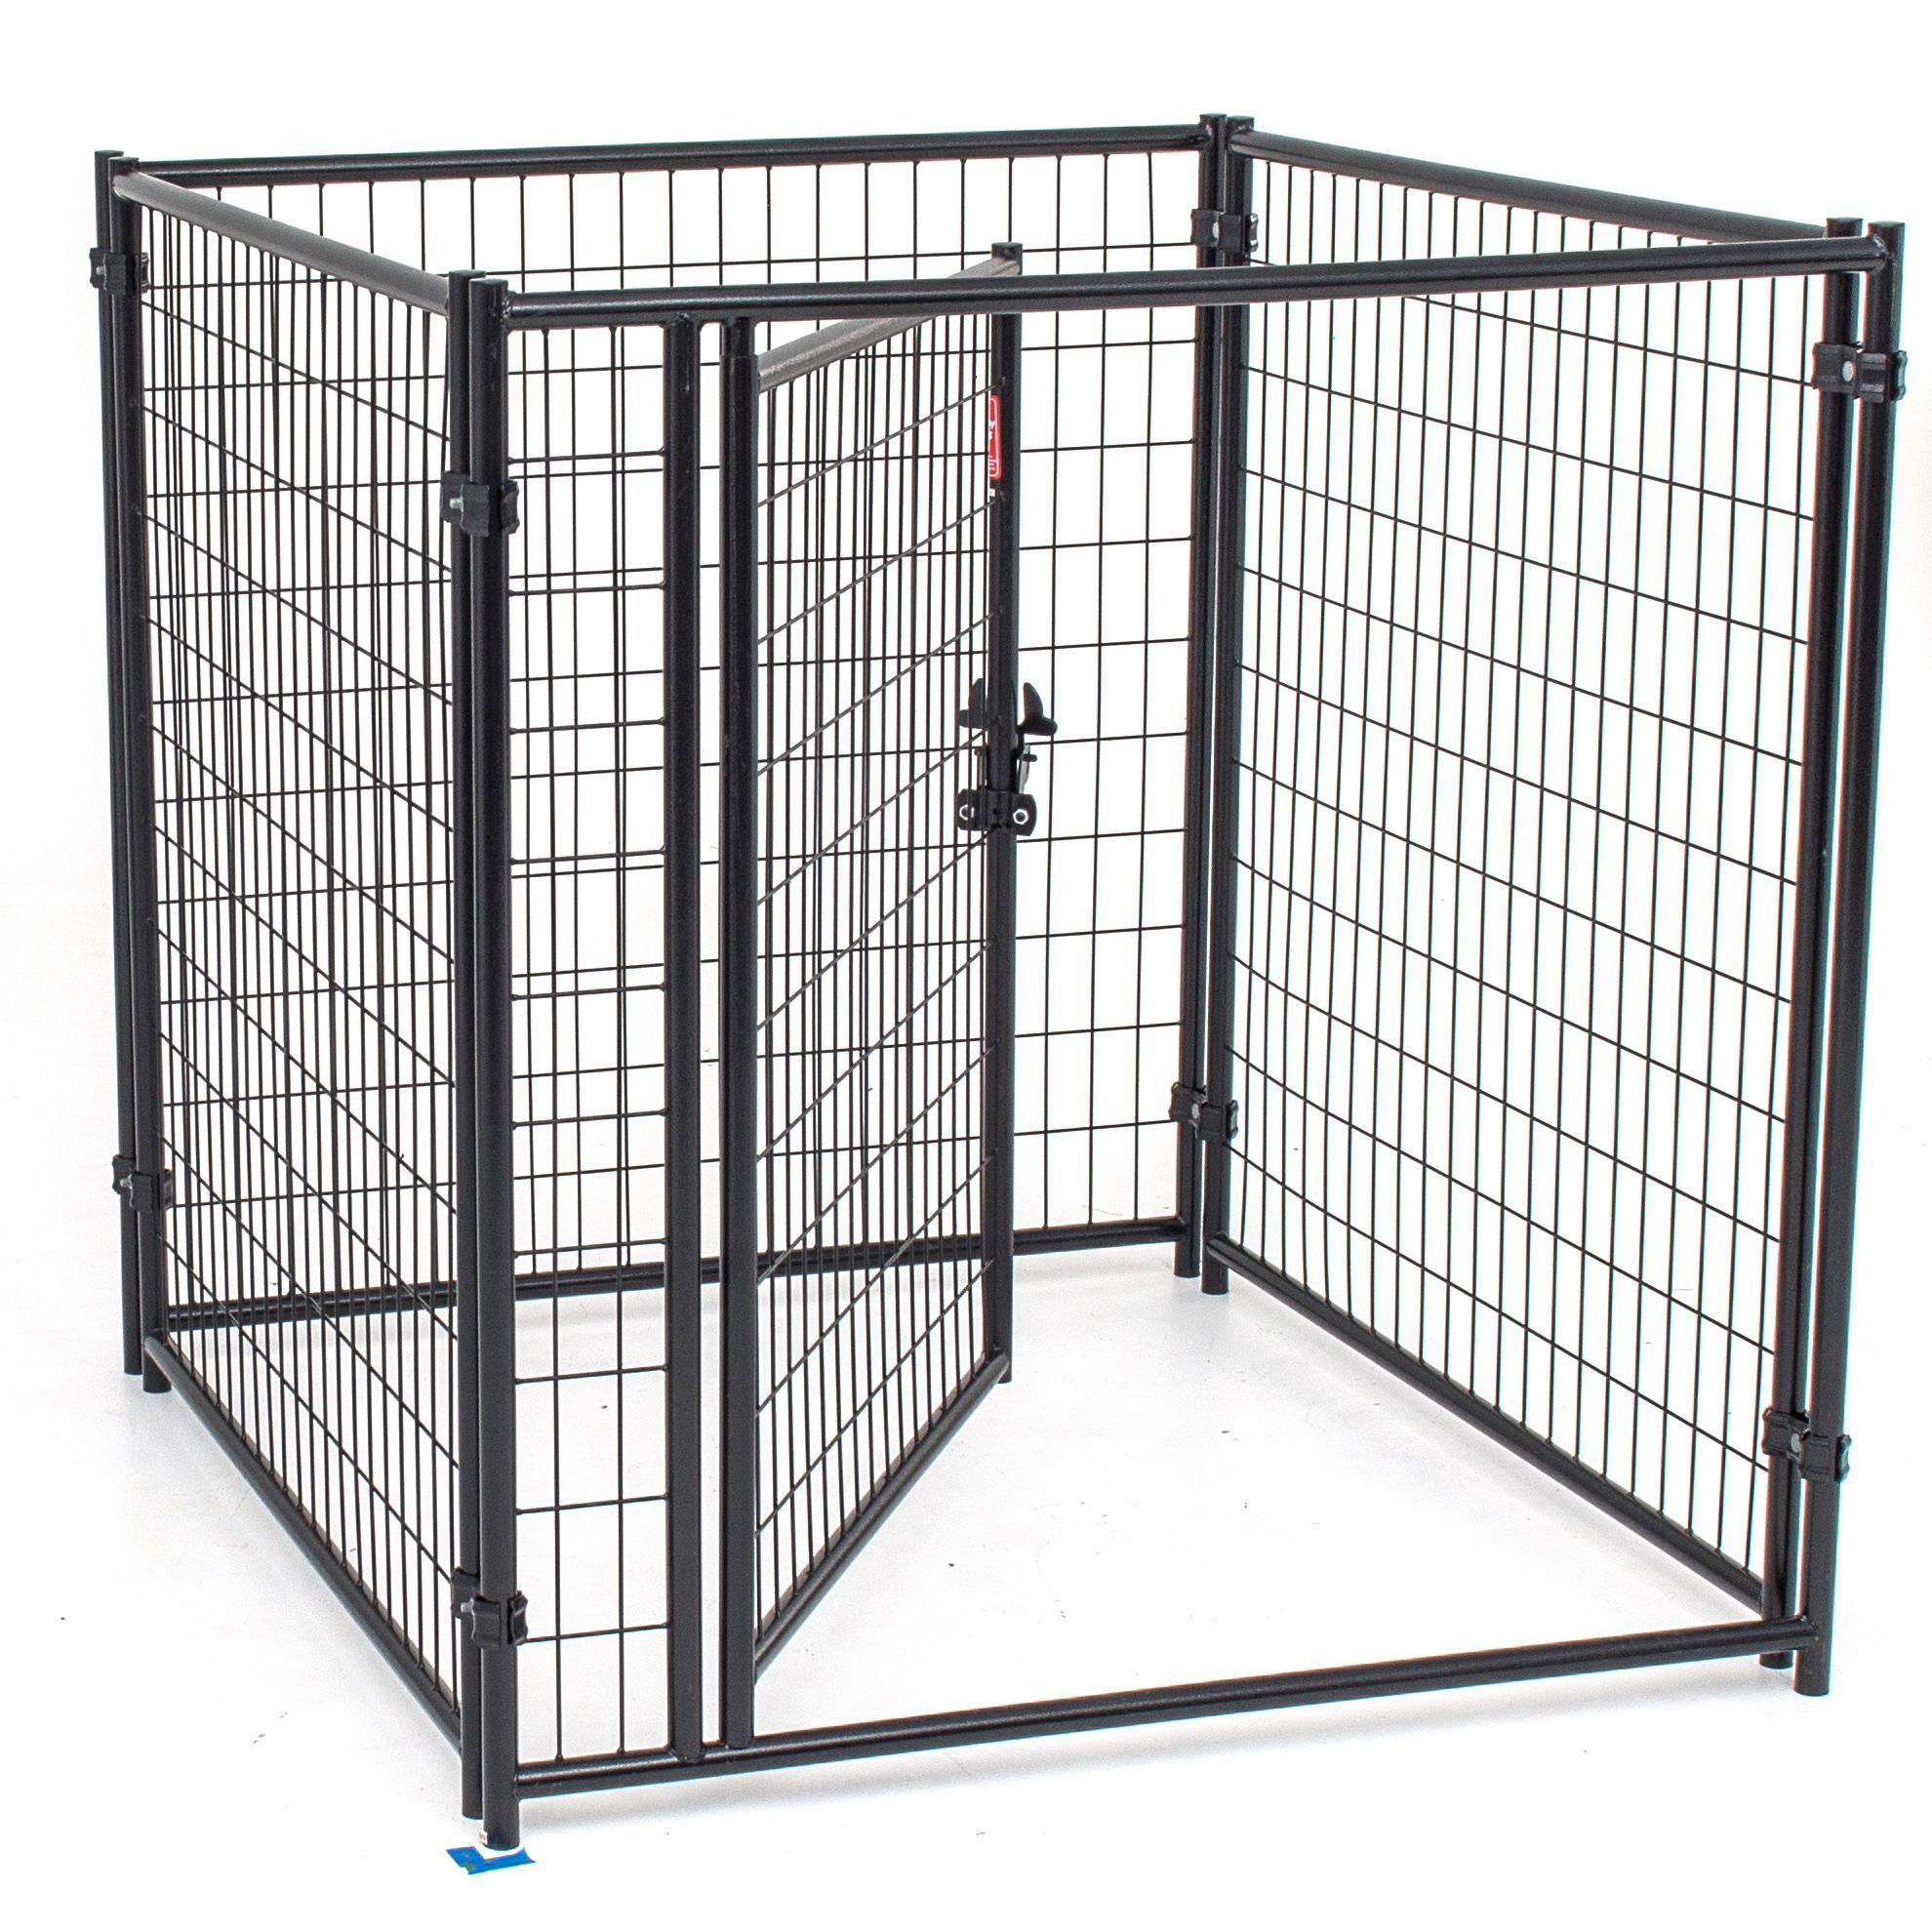 Lucky Dog 4 Foot Modular Welded Steel Wire Dog Kennel Kit 4 Feet